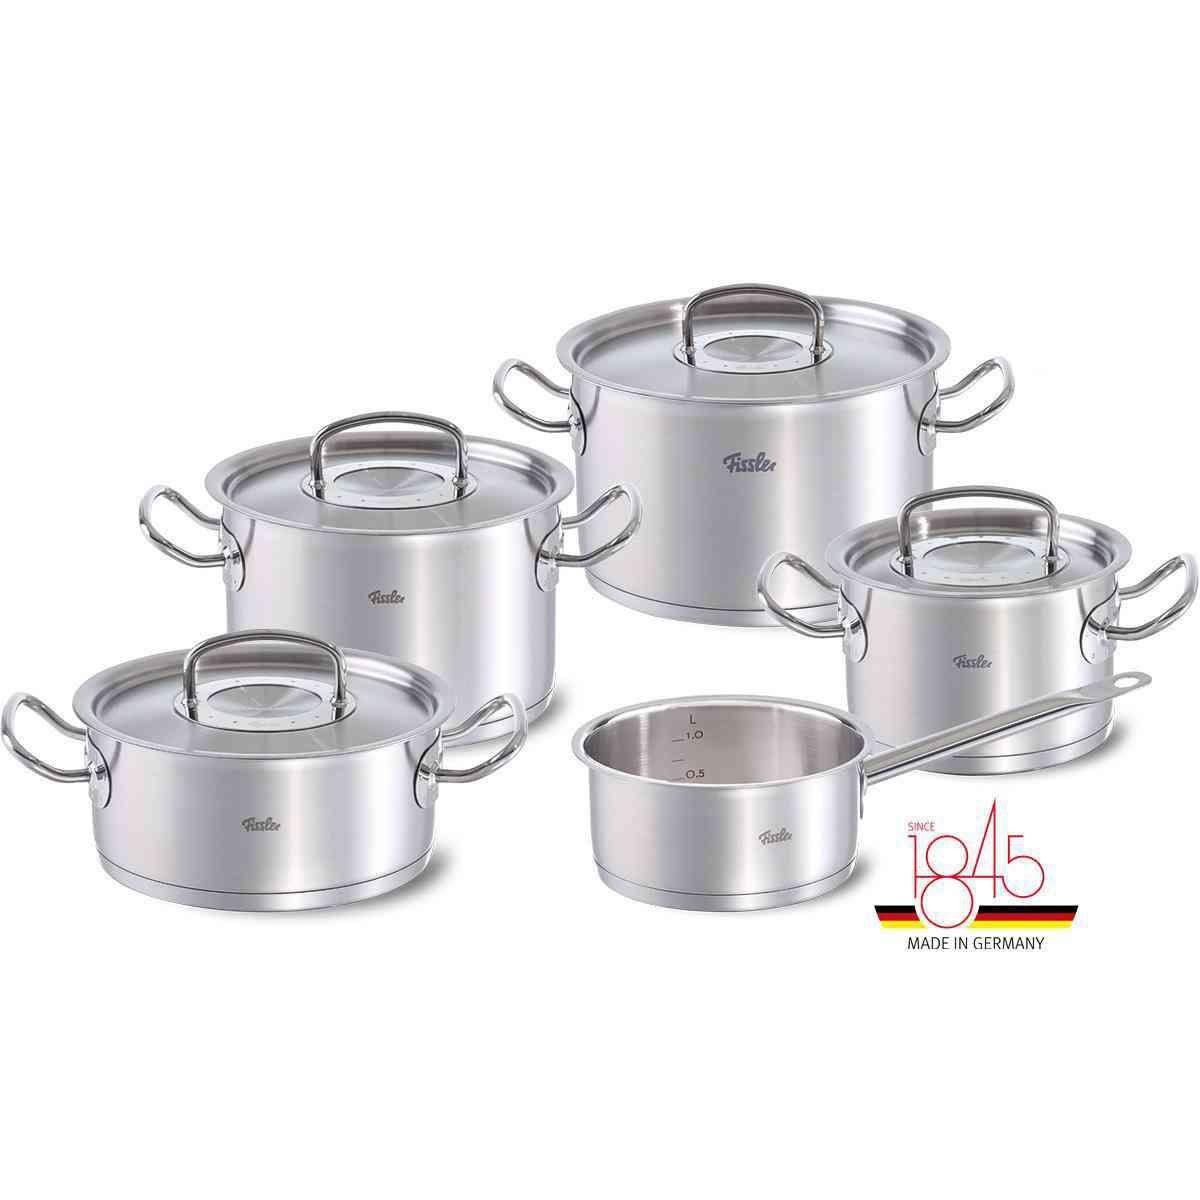 original-profi collection® 9-Piece Stainless Steel Cookware Set